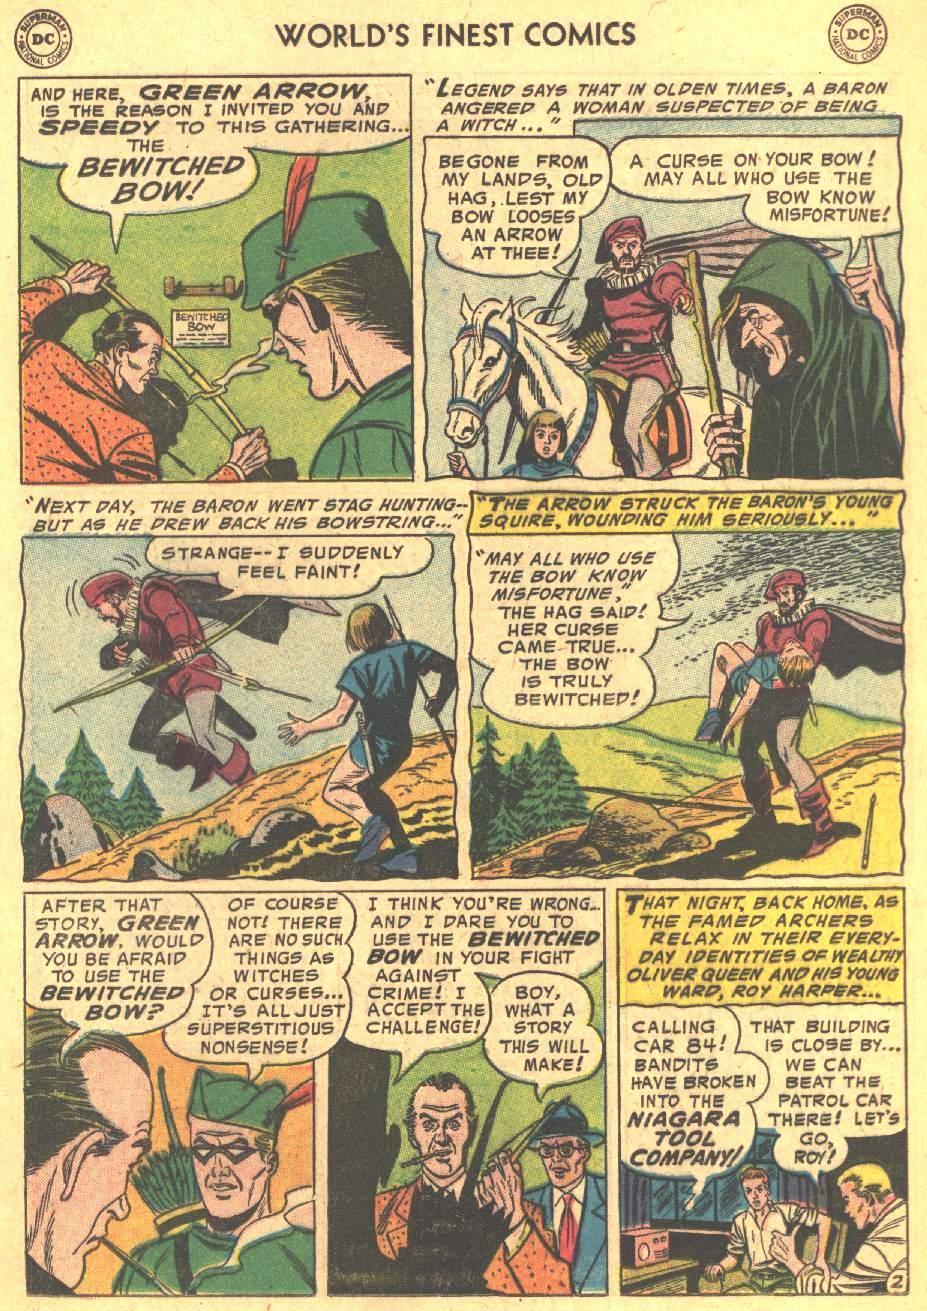 Read online World's Finest Comics comic -  Issue #80 - 19